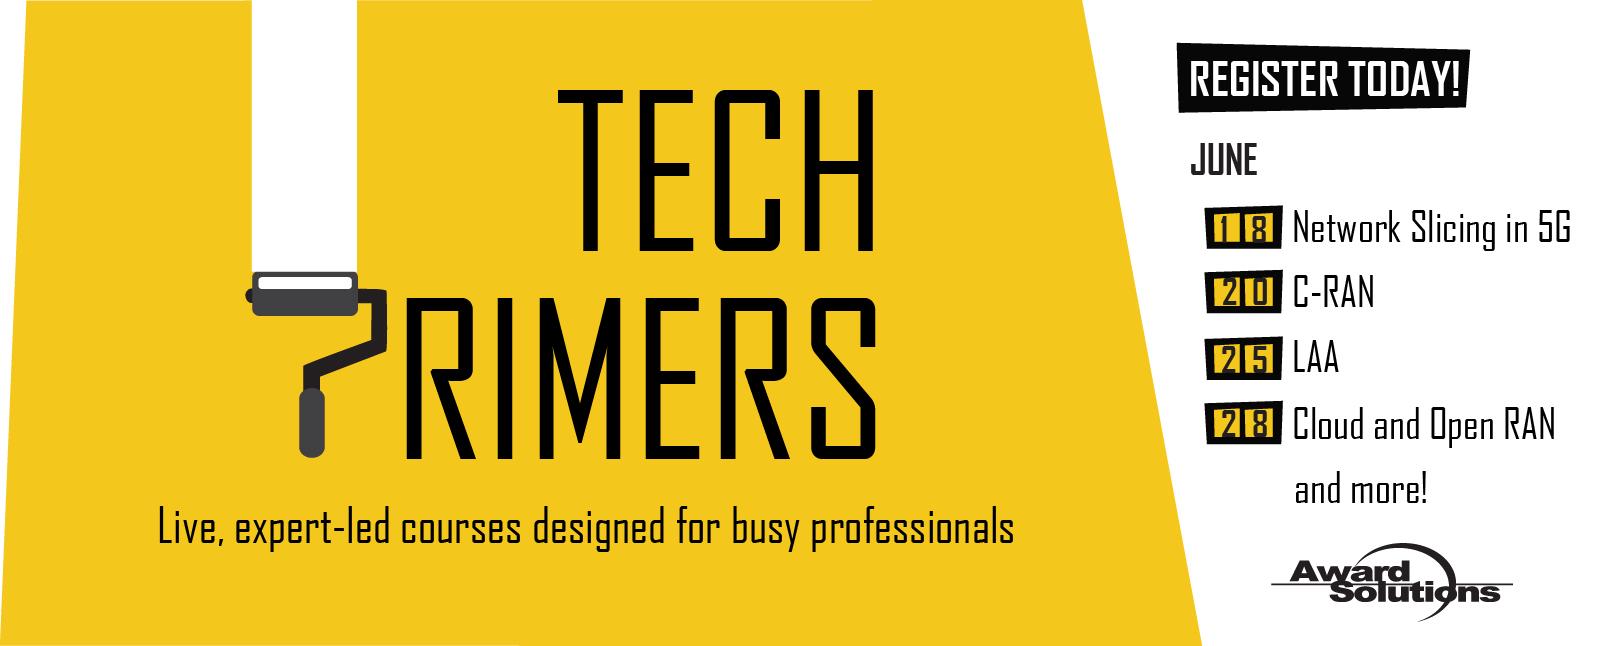 Tech Primers Americas June second half 2018 Website 775 x 310-01.jpg